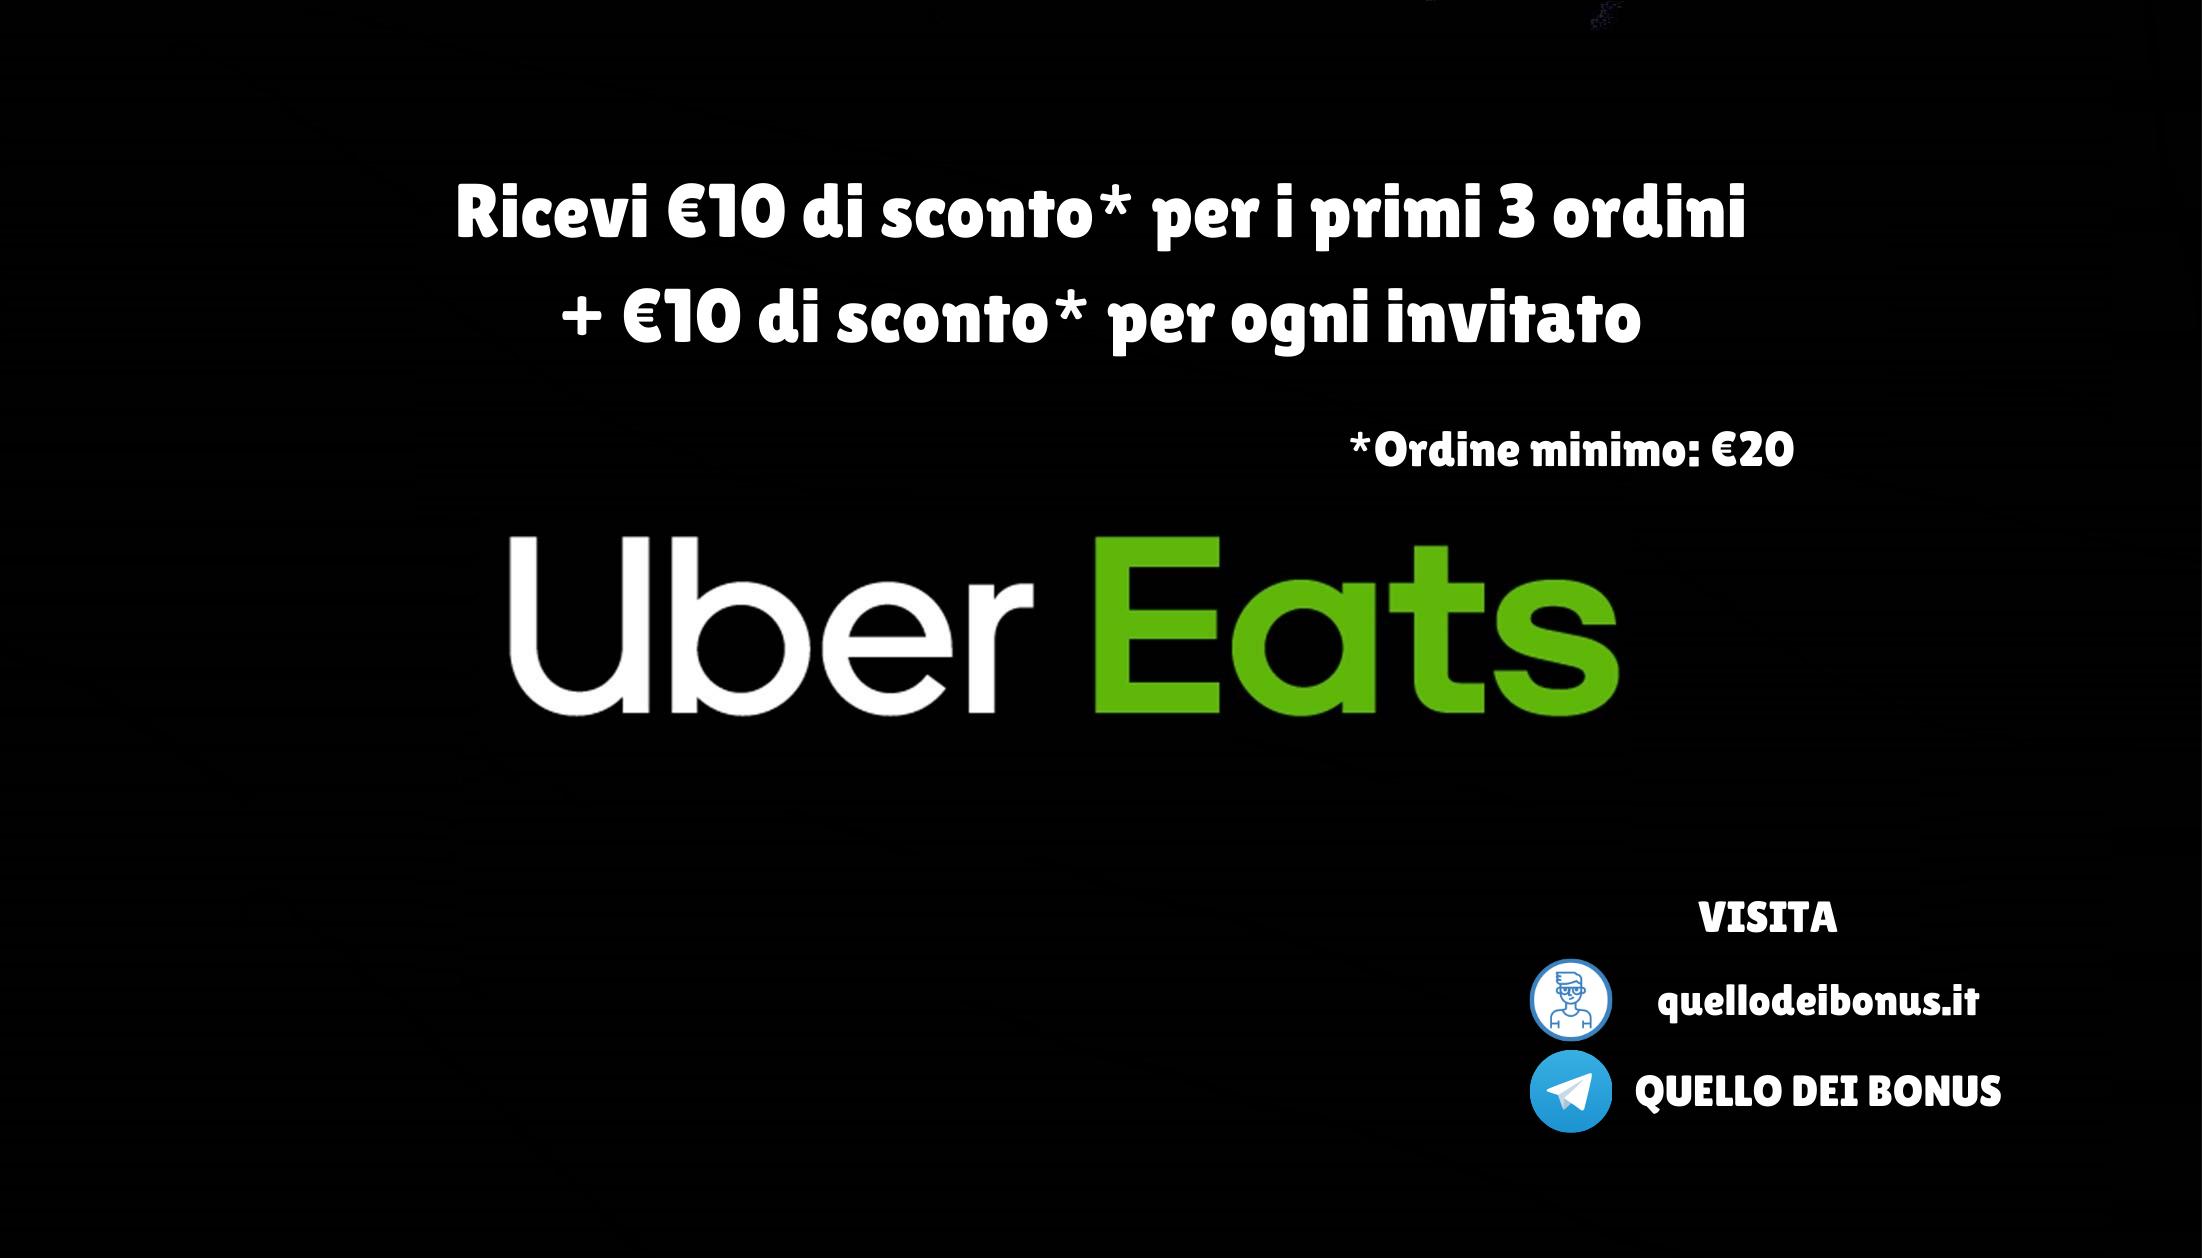 uber eats bonus